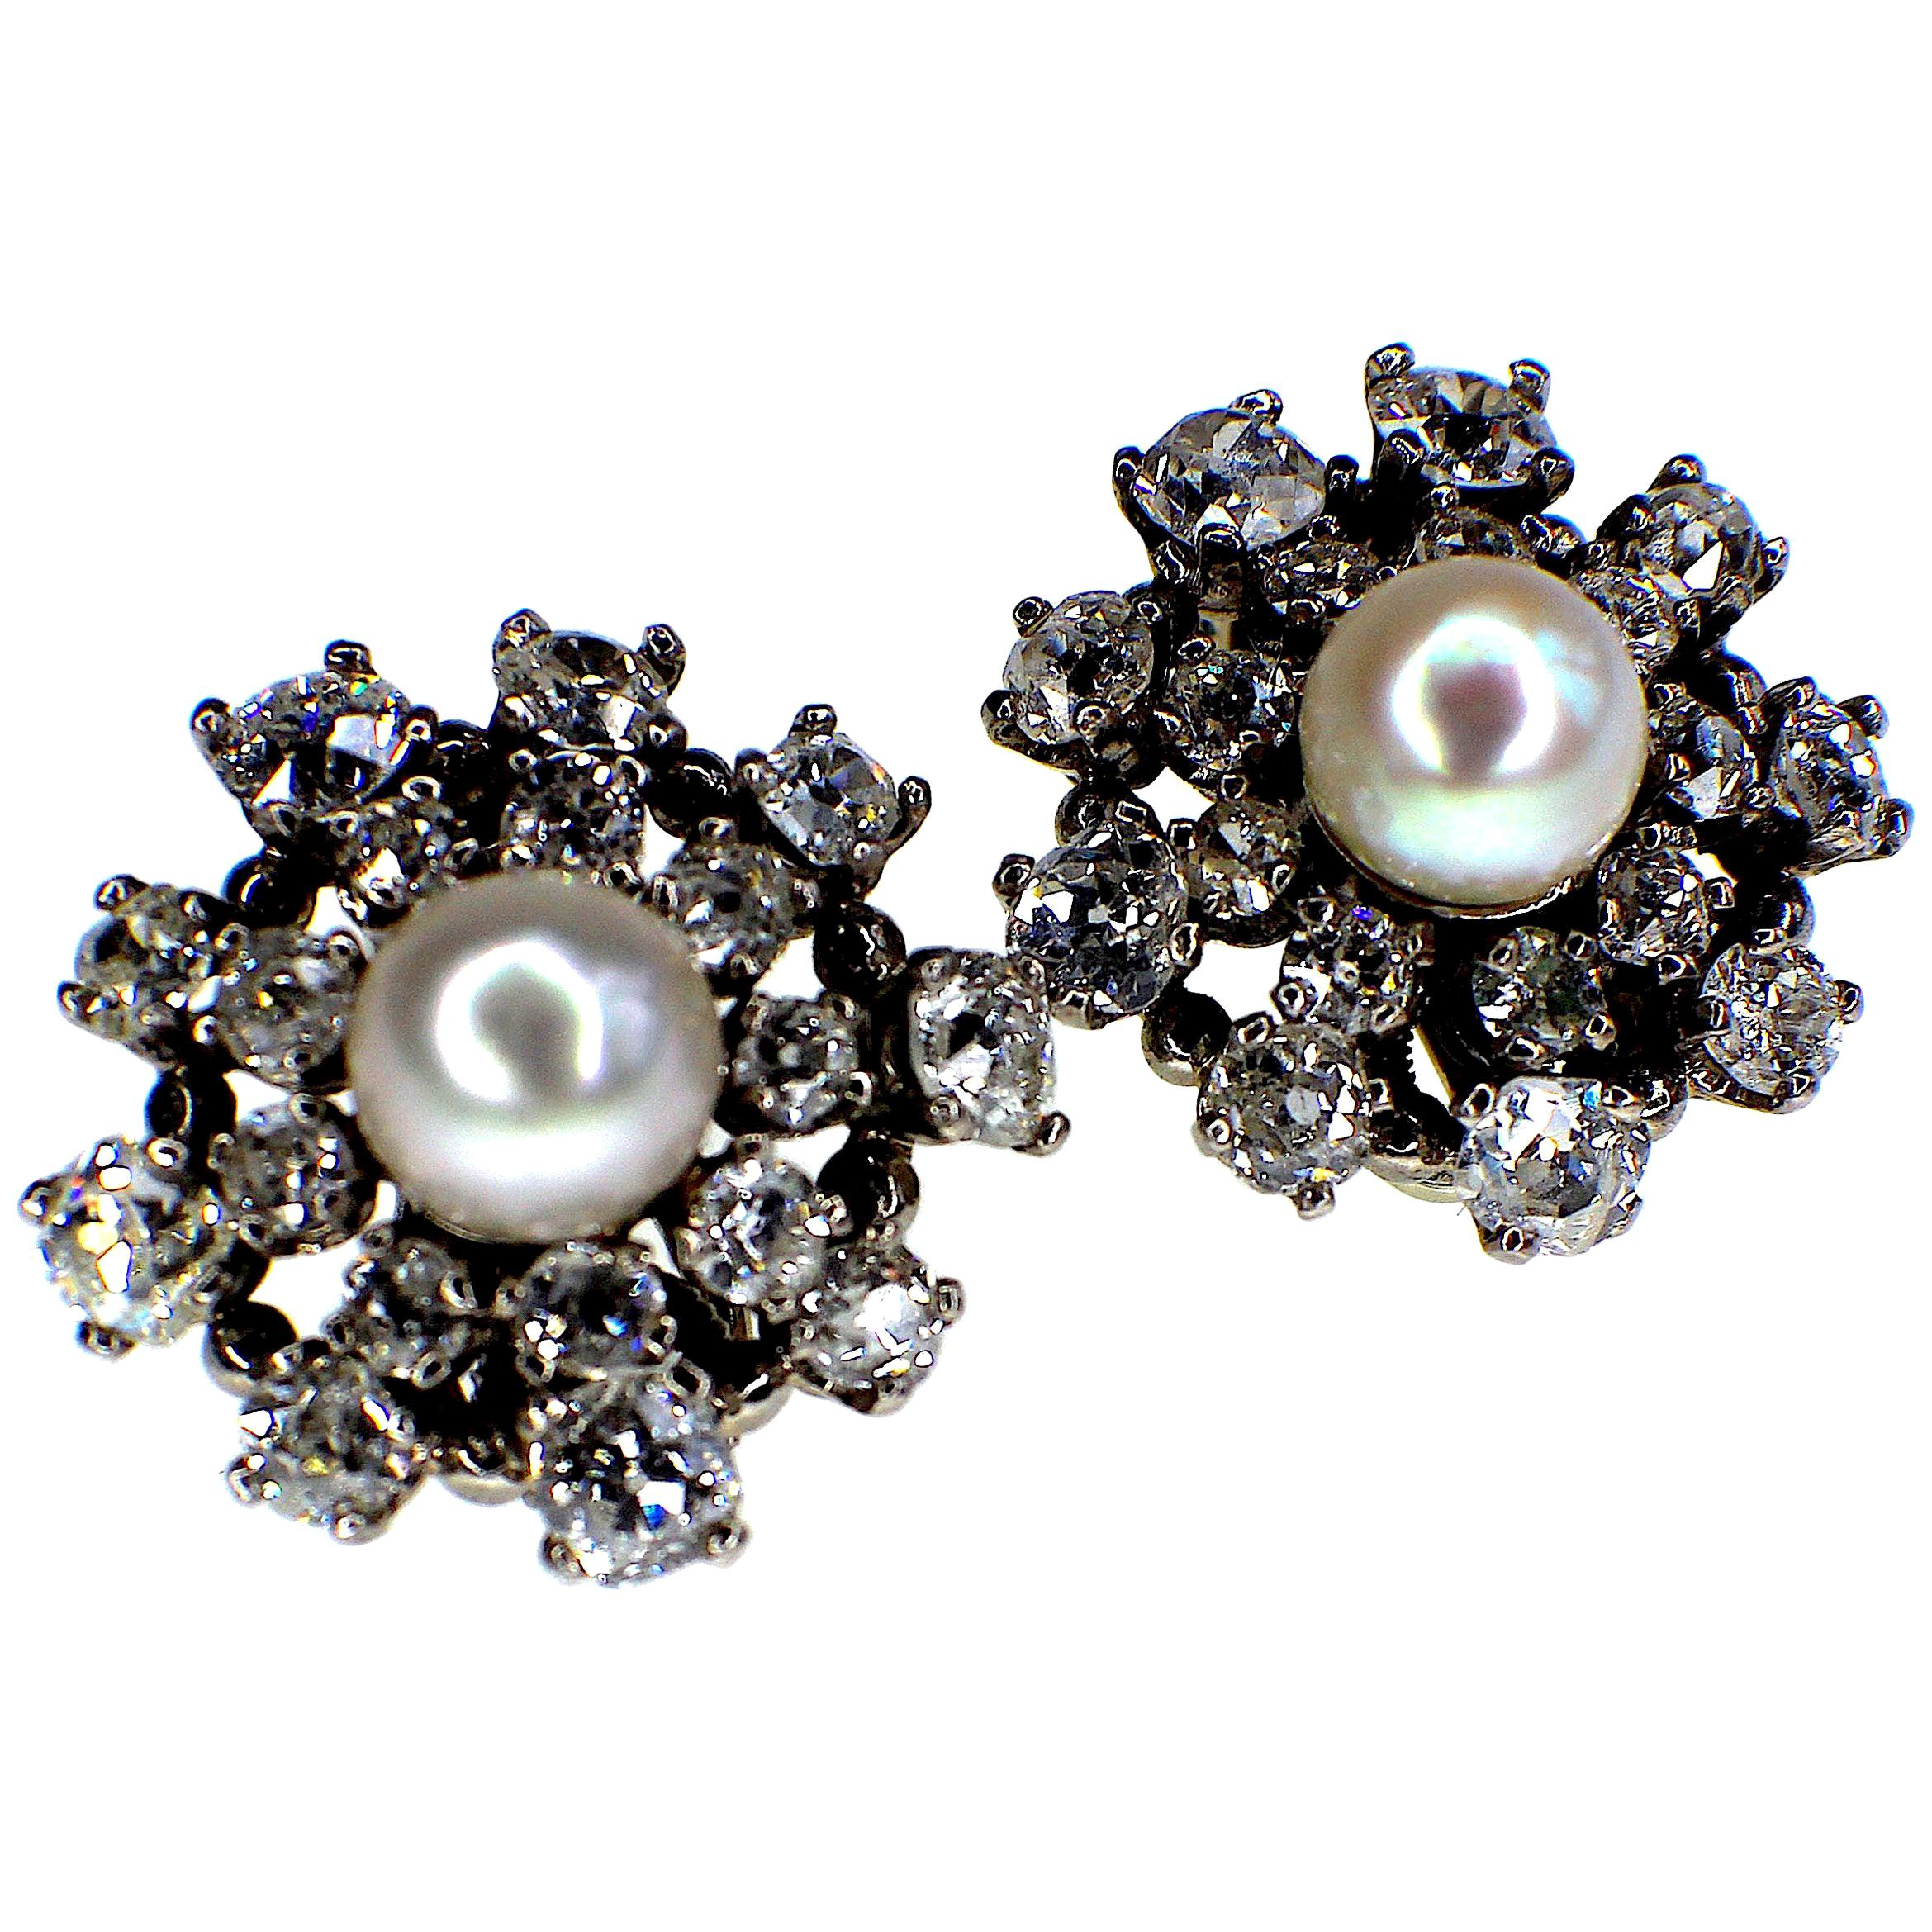 Gemolithos Beautiful Natural Pearl and Diamond Earrings, 1950s